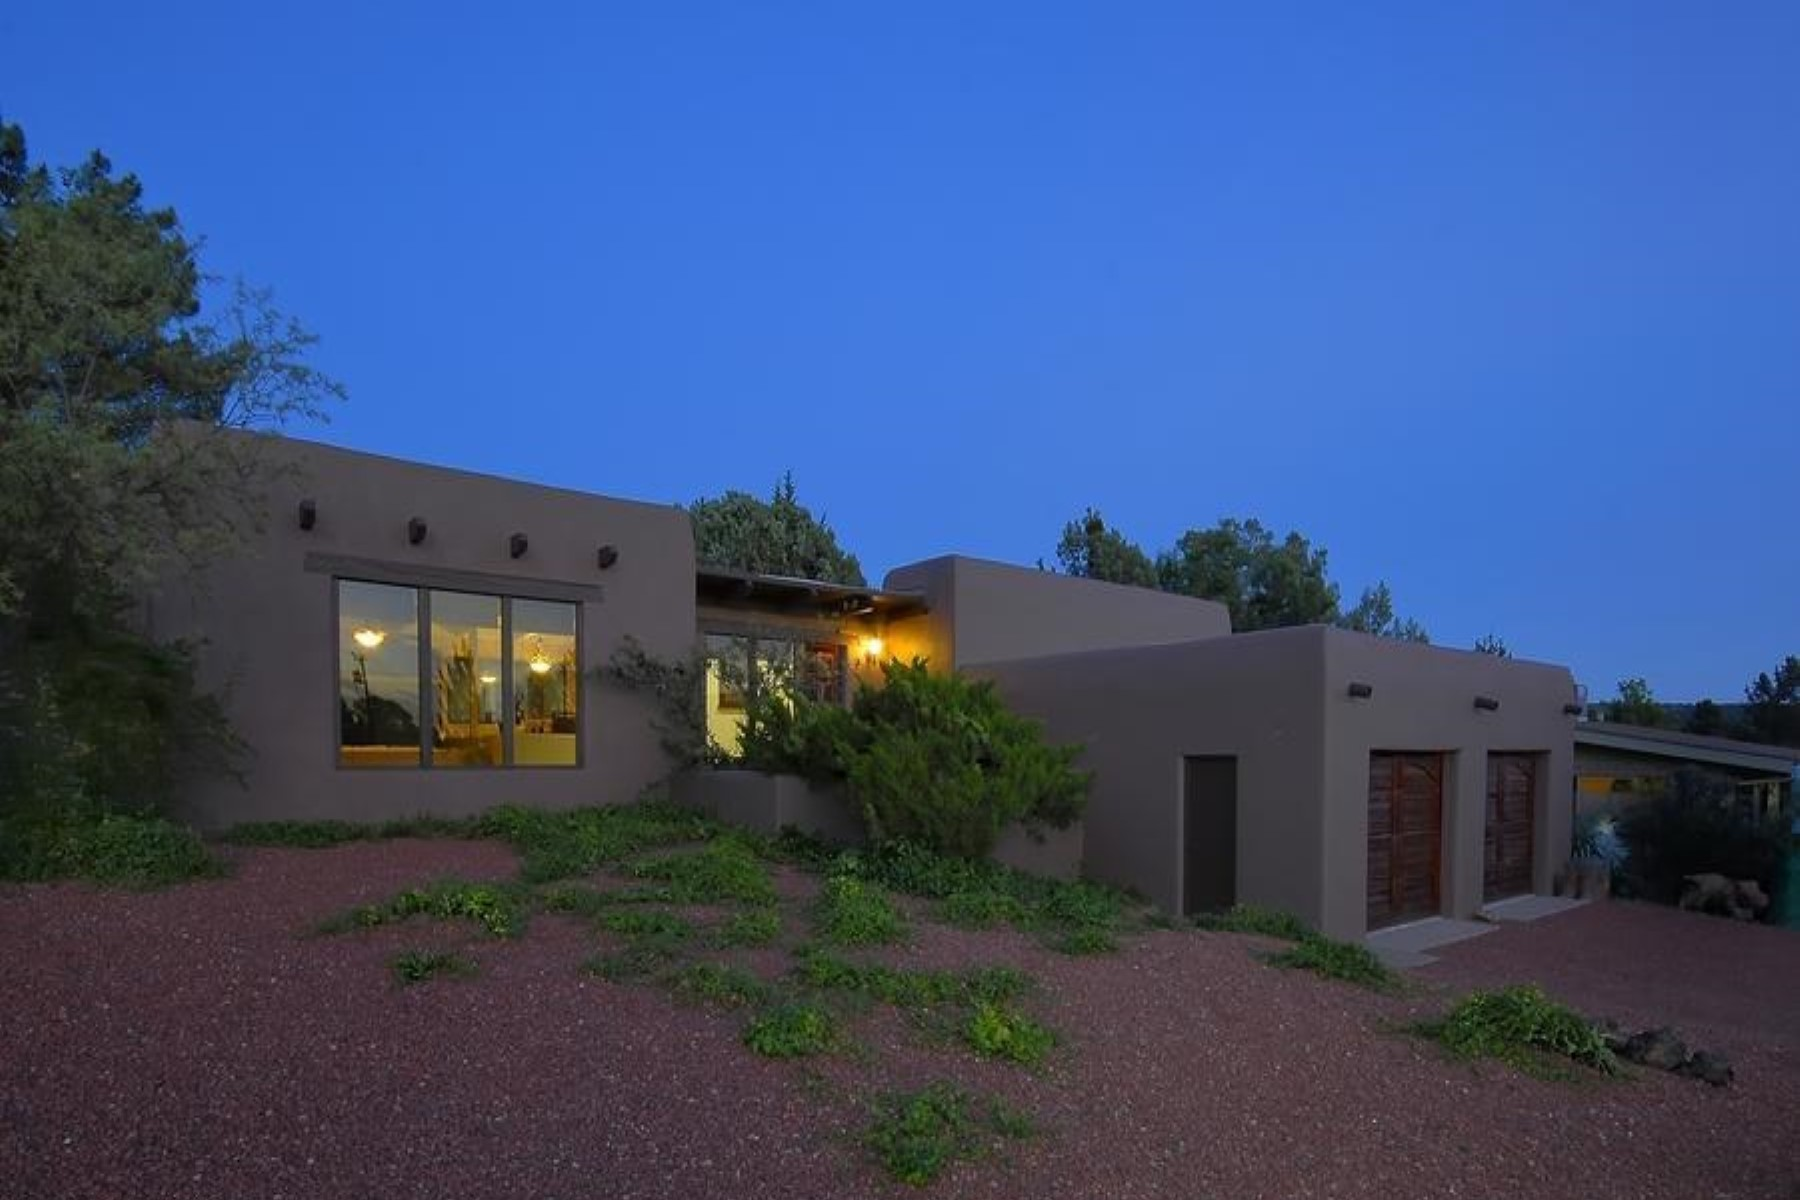 Moradia para Venda às Southwestern Pueblo style home with Red Rock views. 580 Mountain Shadows Drive Sedona, Arizona 86336 Estados Unidos